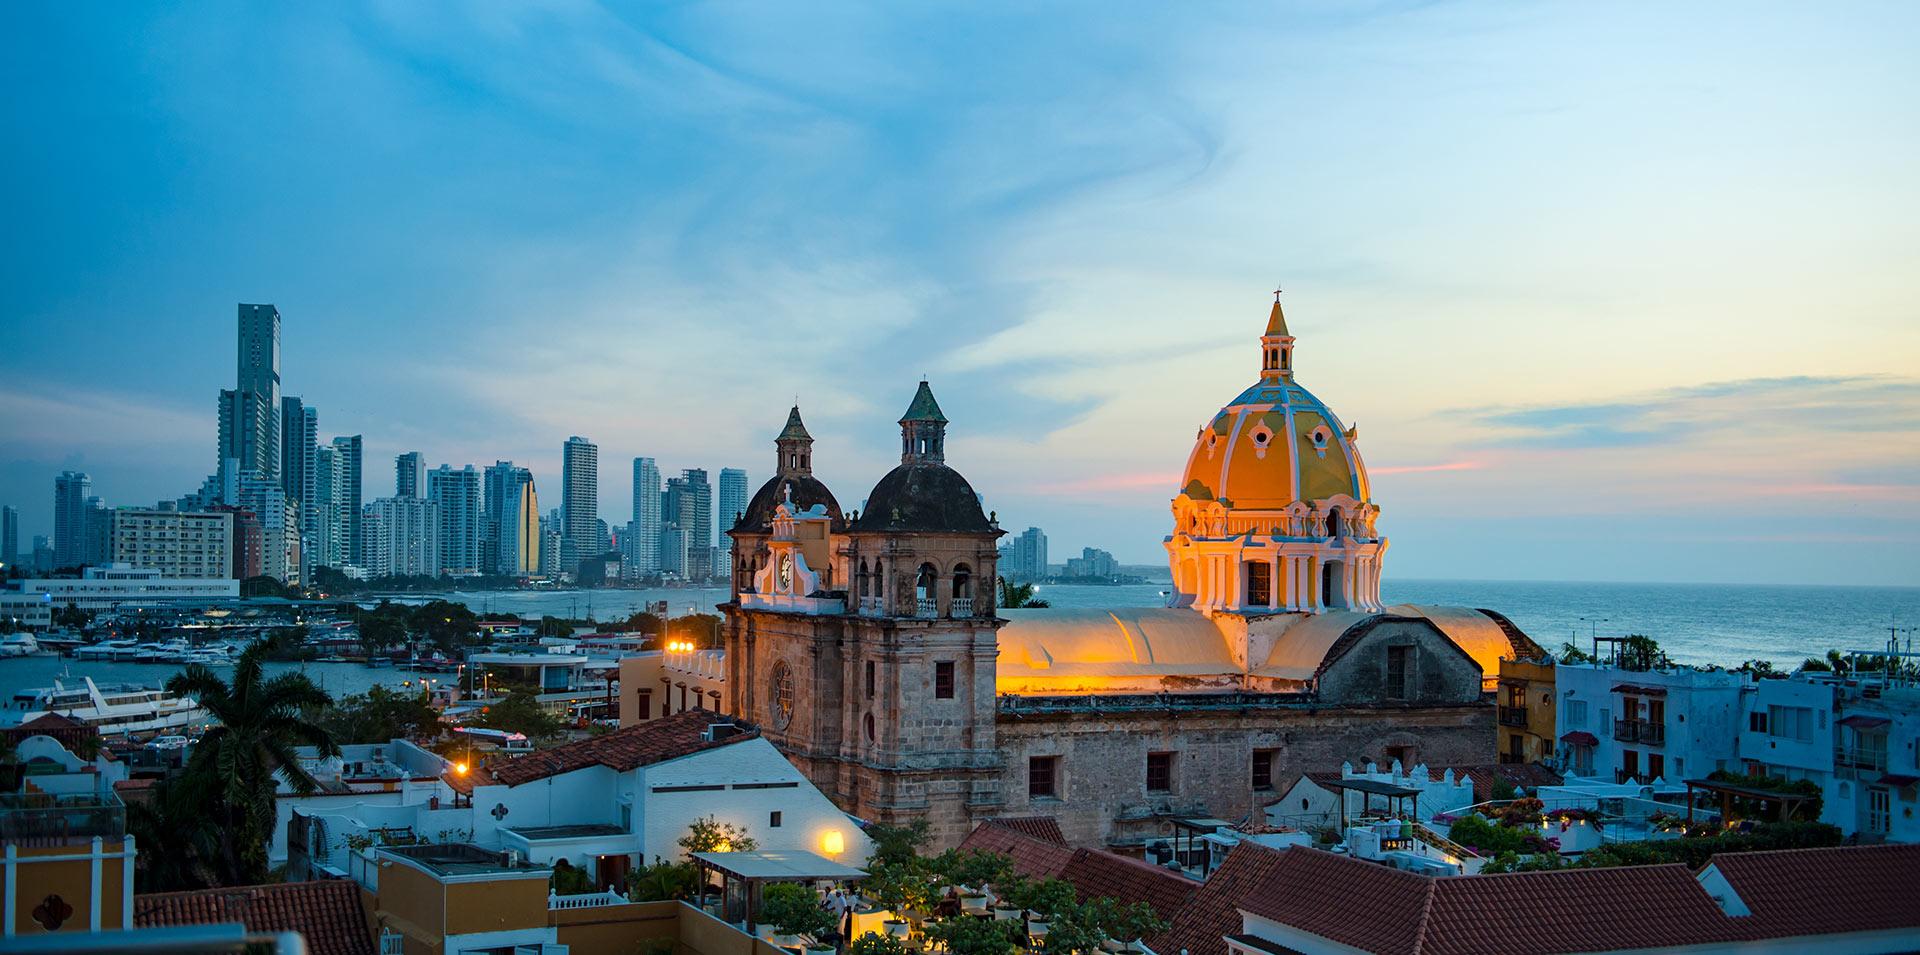 San Pedro Claver church in Cartagena